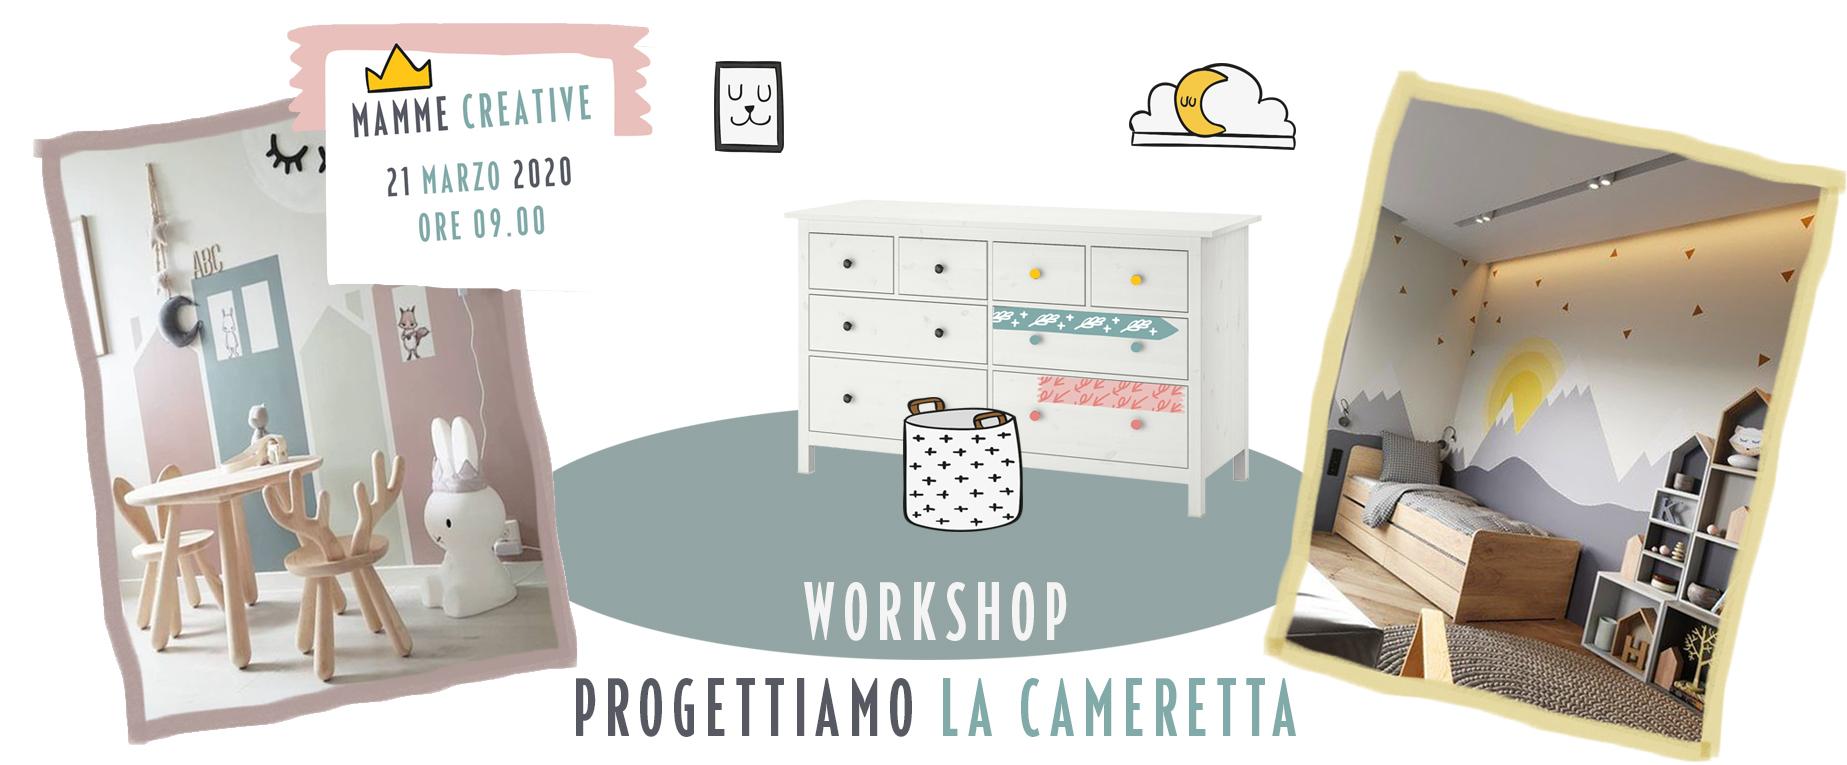 immagine sito workshop